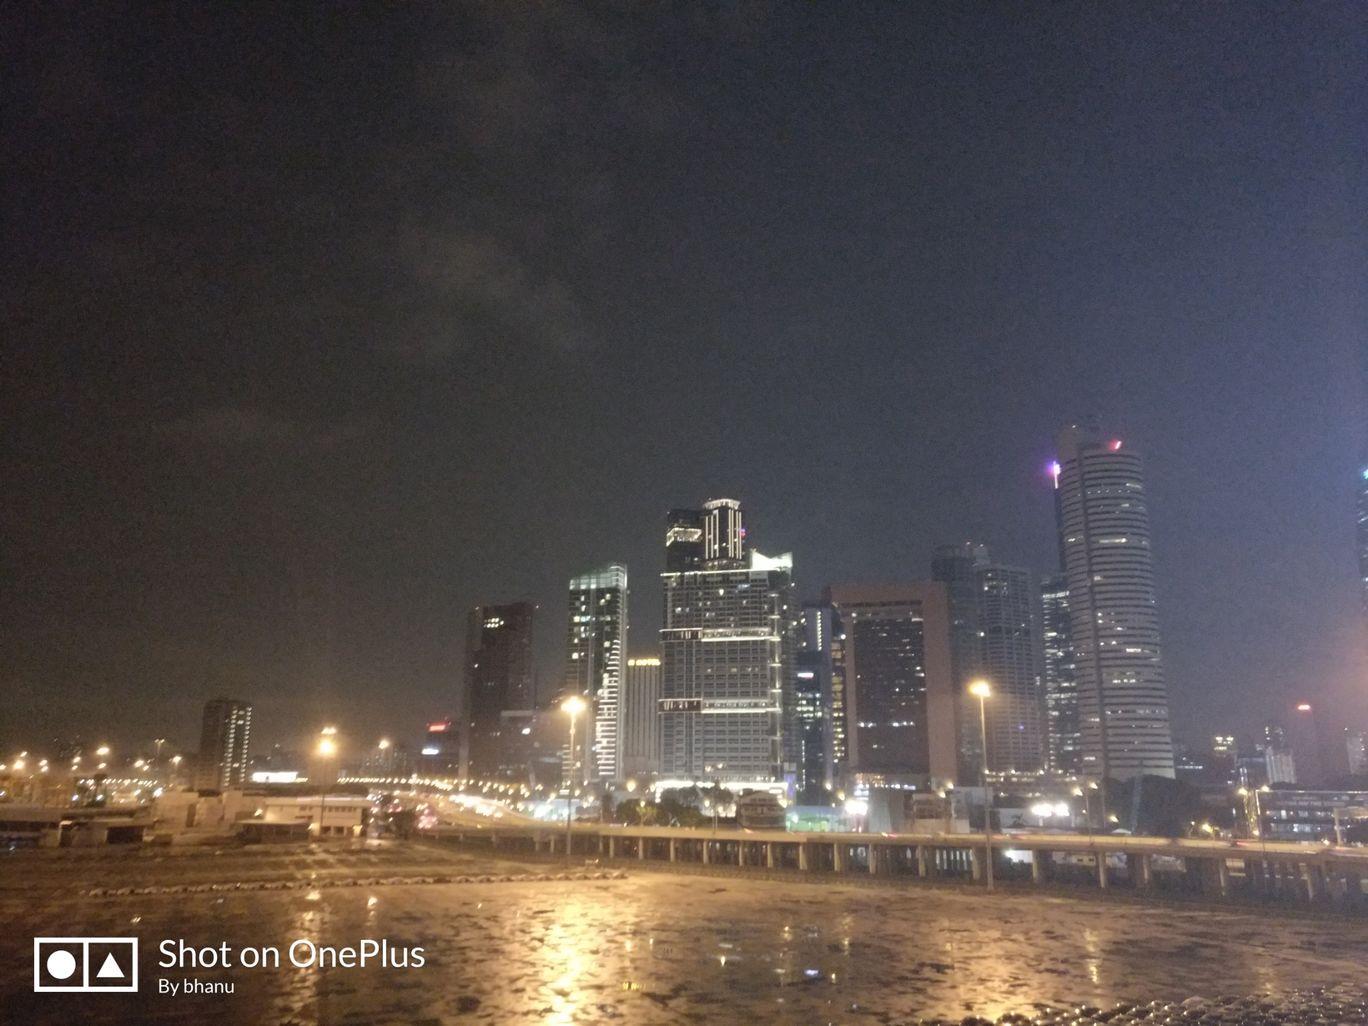 Photo of Singapore By bhanu aswal